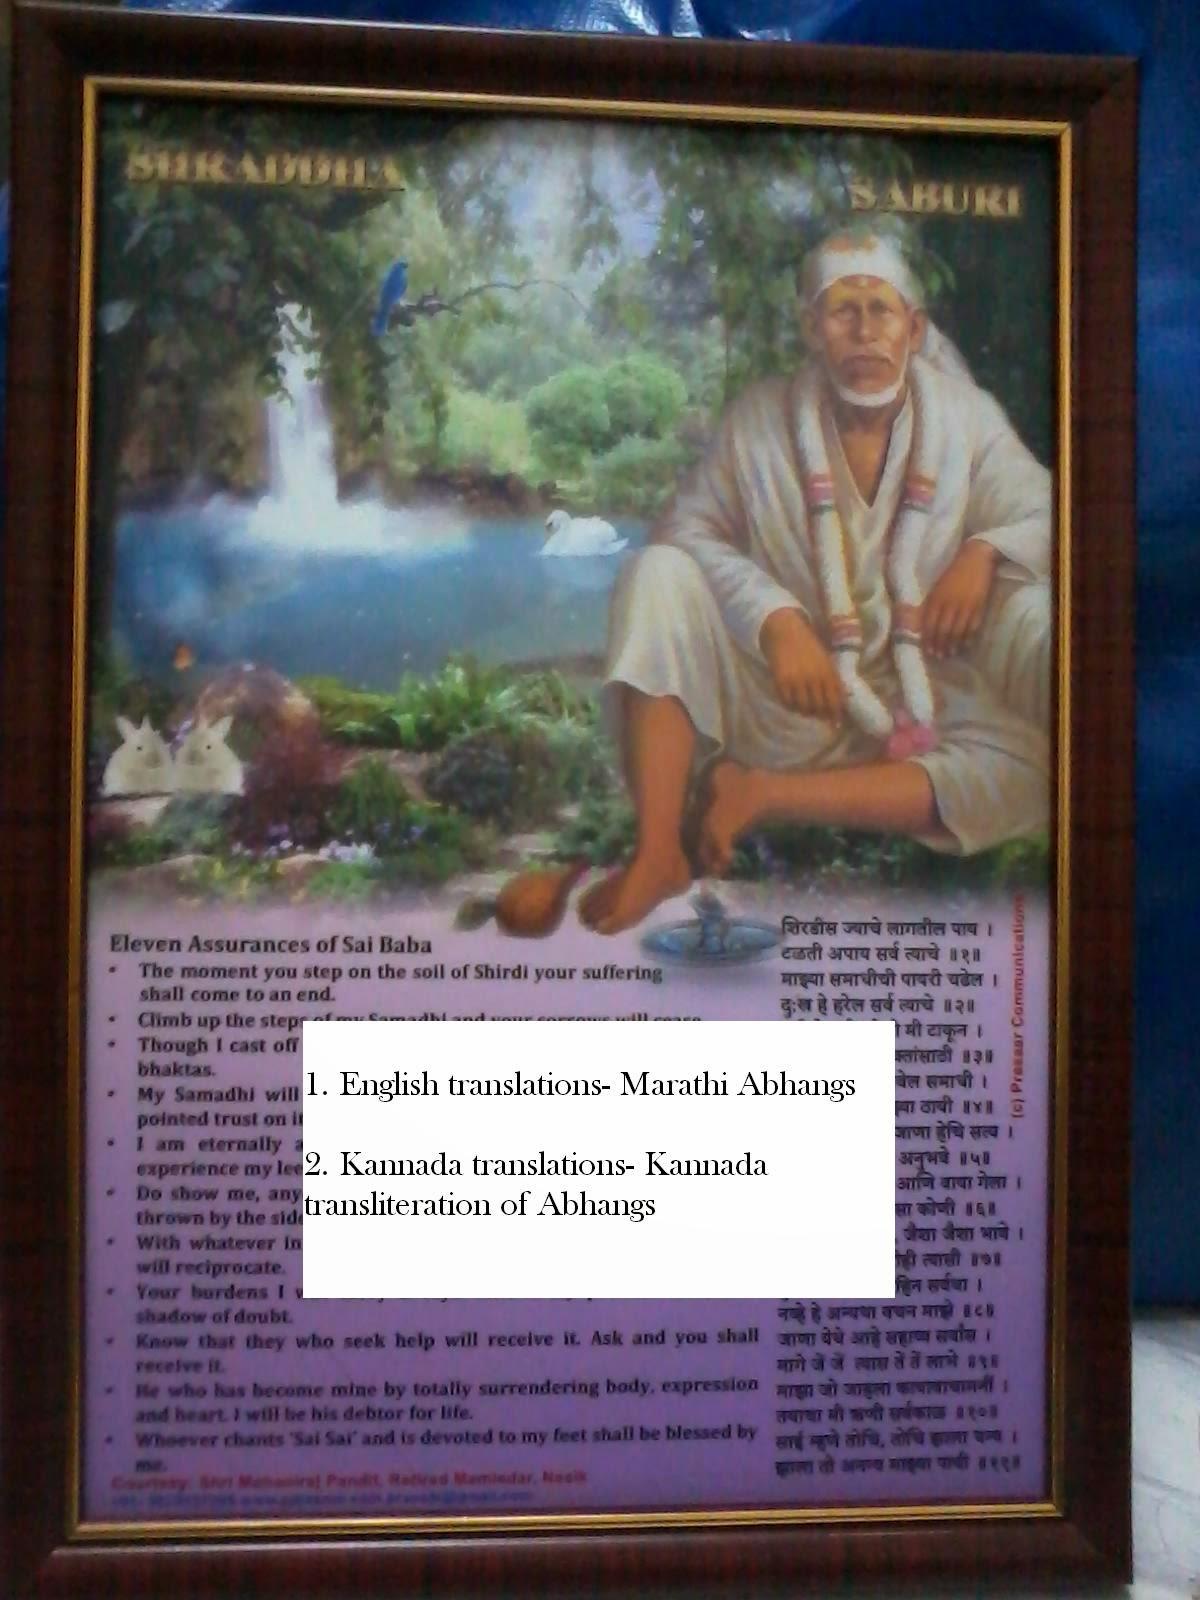 Eleven Assurances of Lord Sai Baba in Photo Frame - Leela Galore